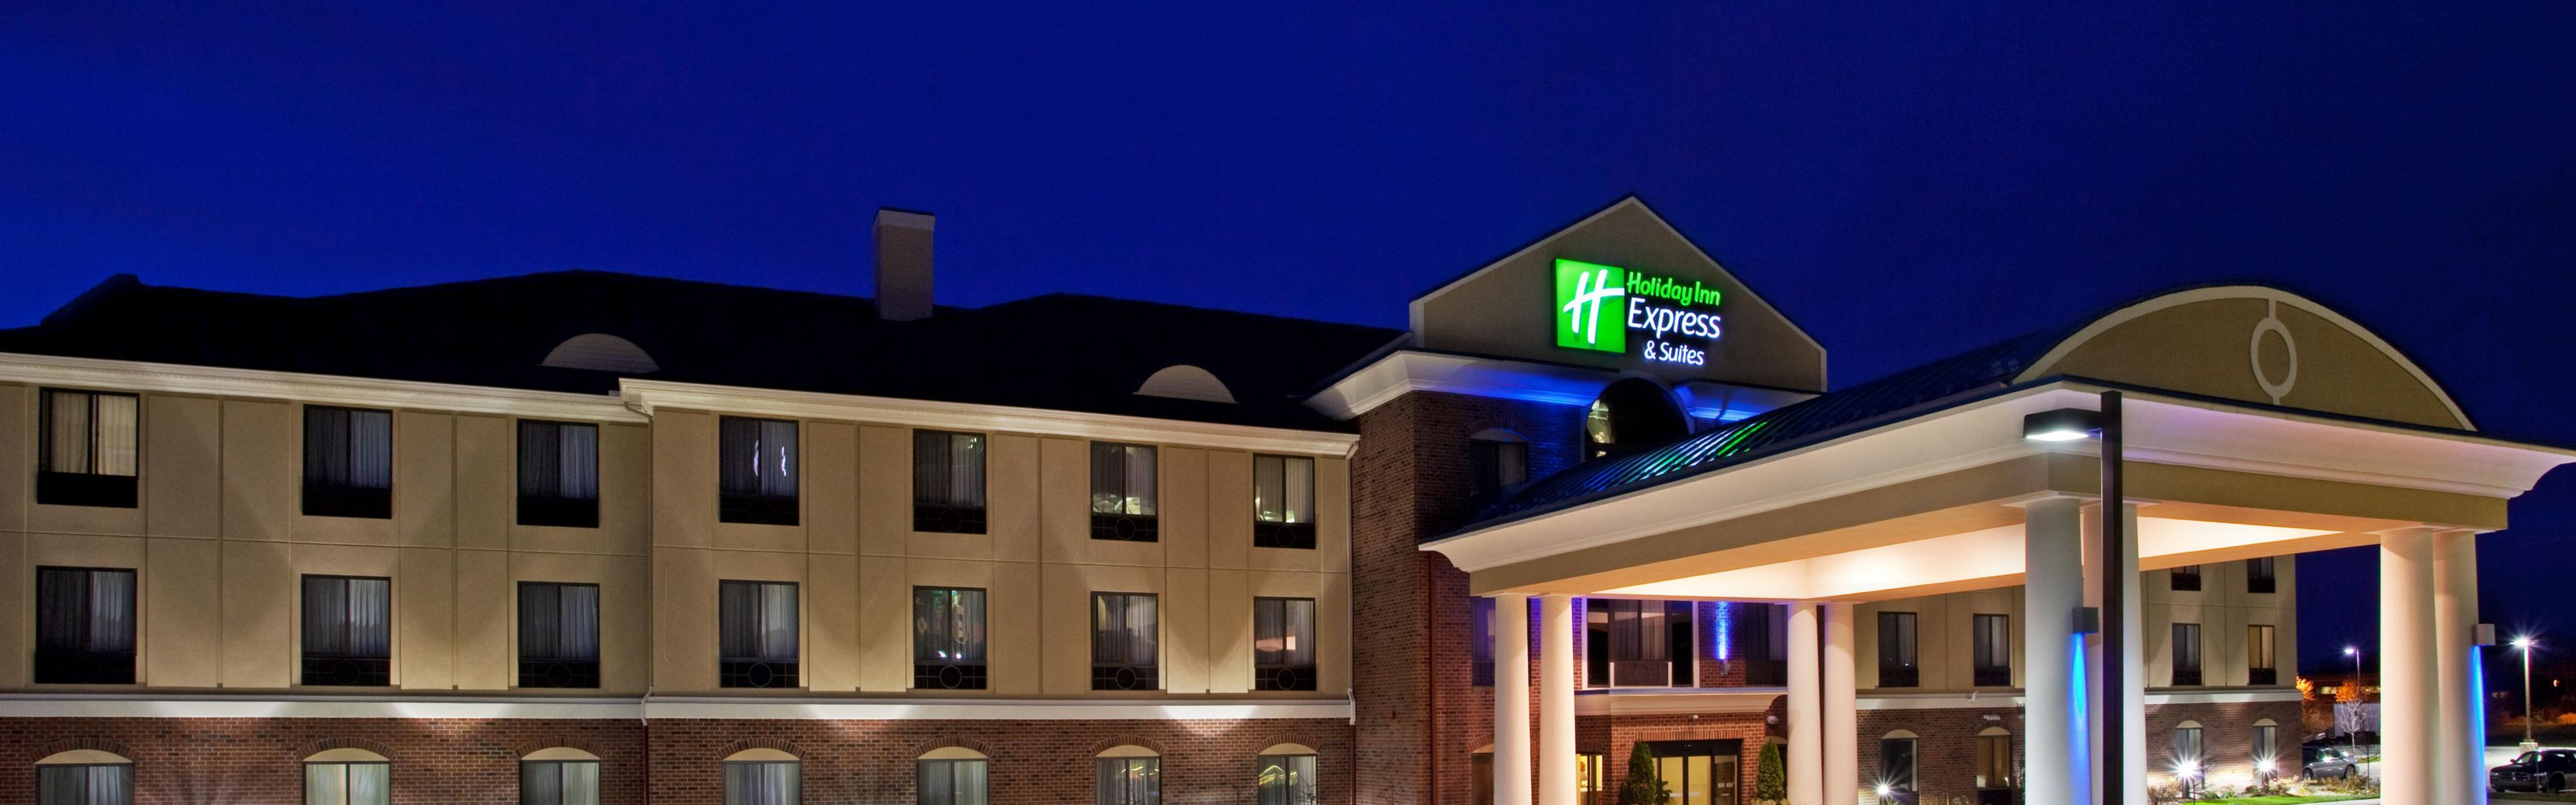 Holiday Inn Express & Suites East Lansing image 0